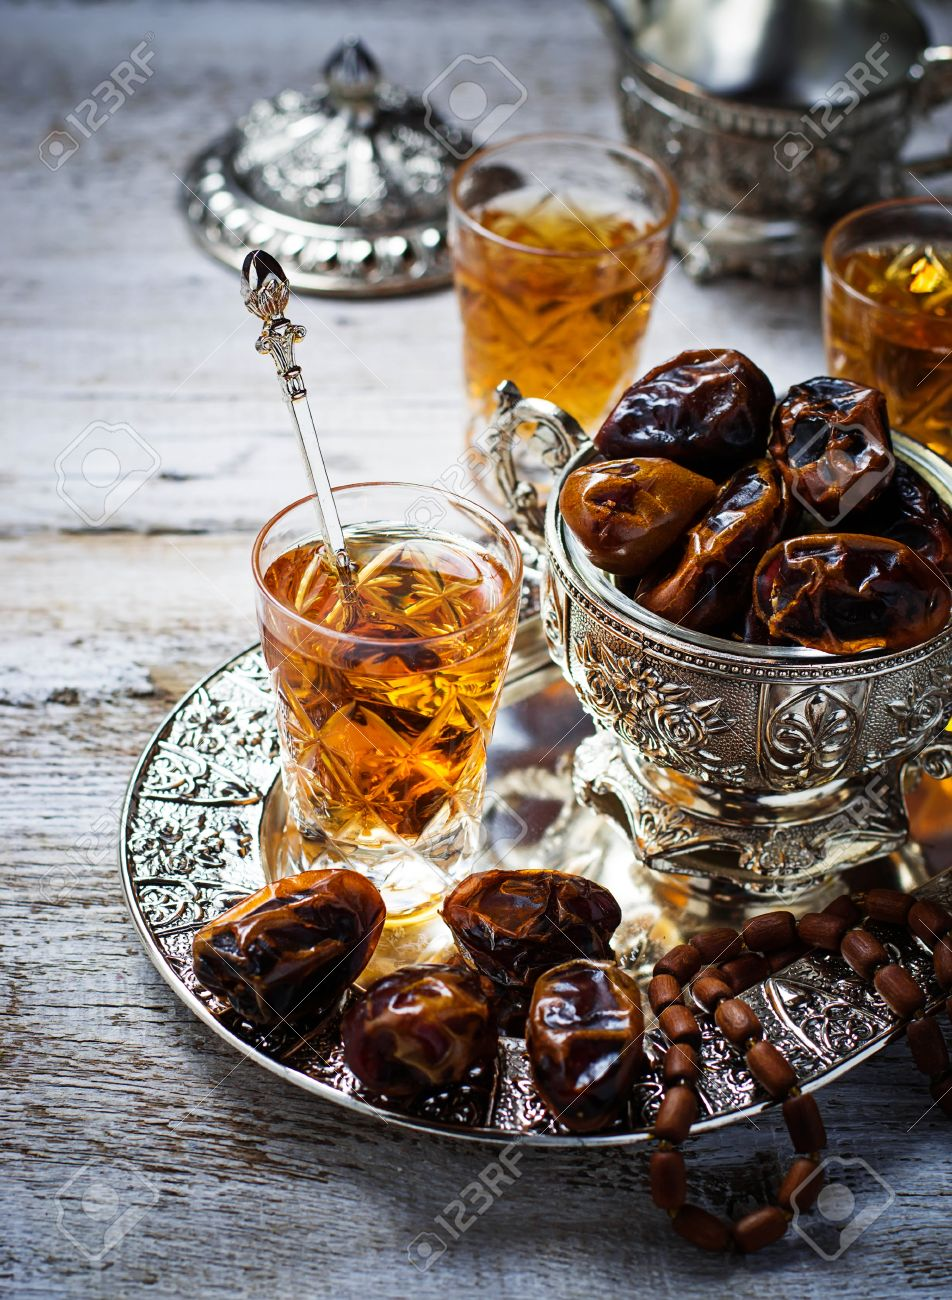 Iftar 3 Ramadan 2019